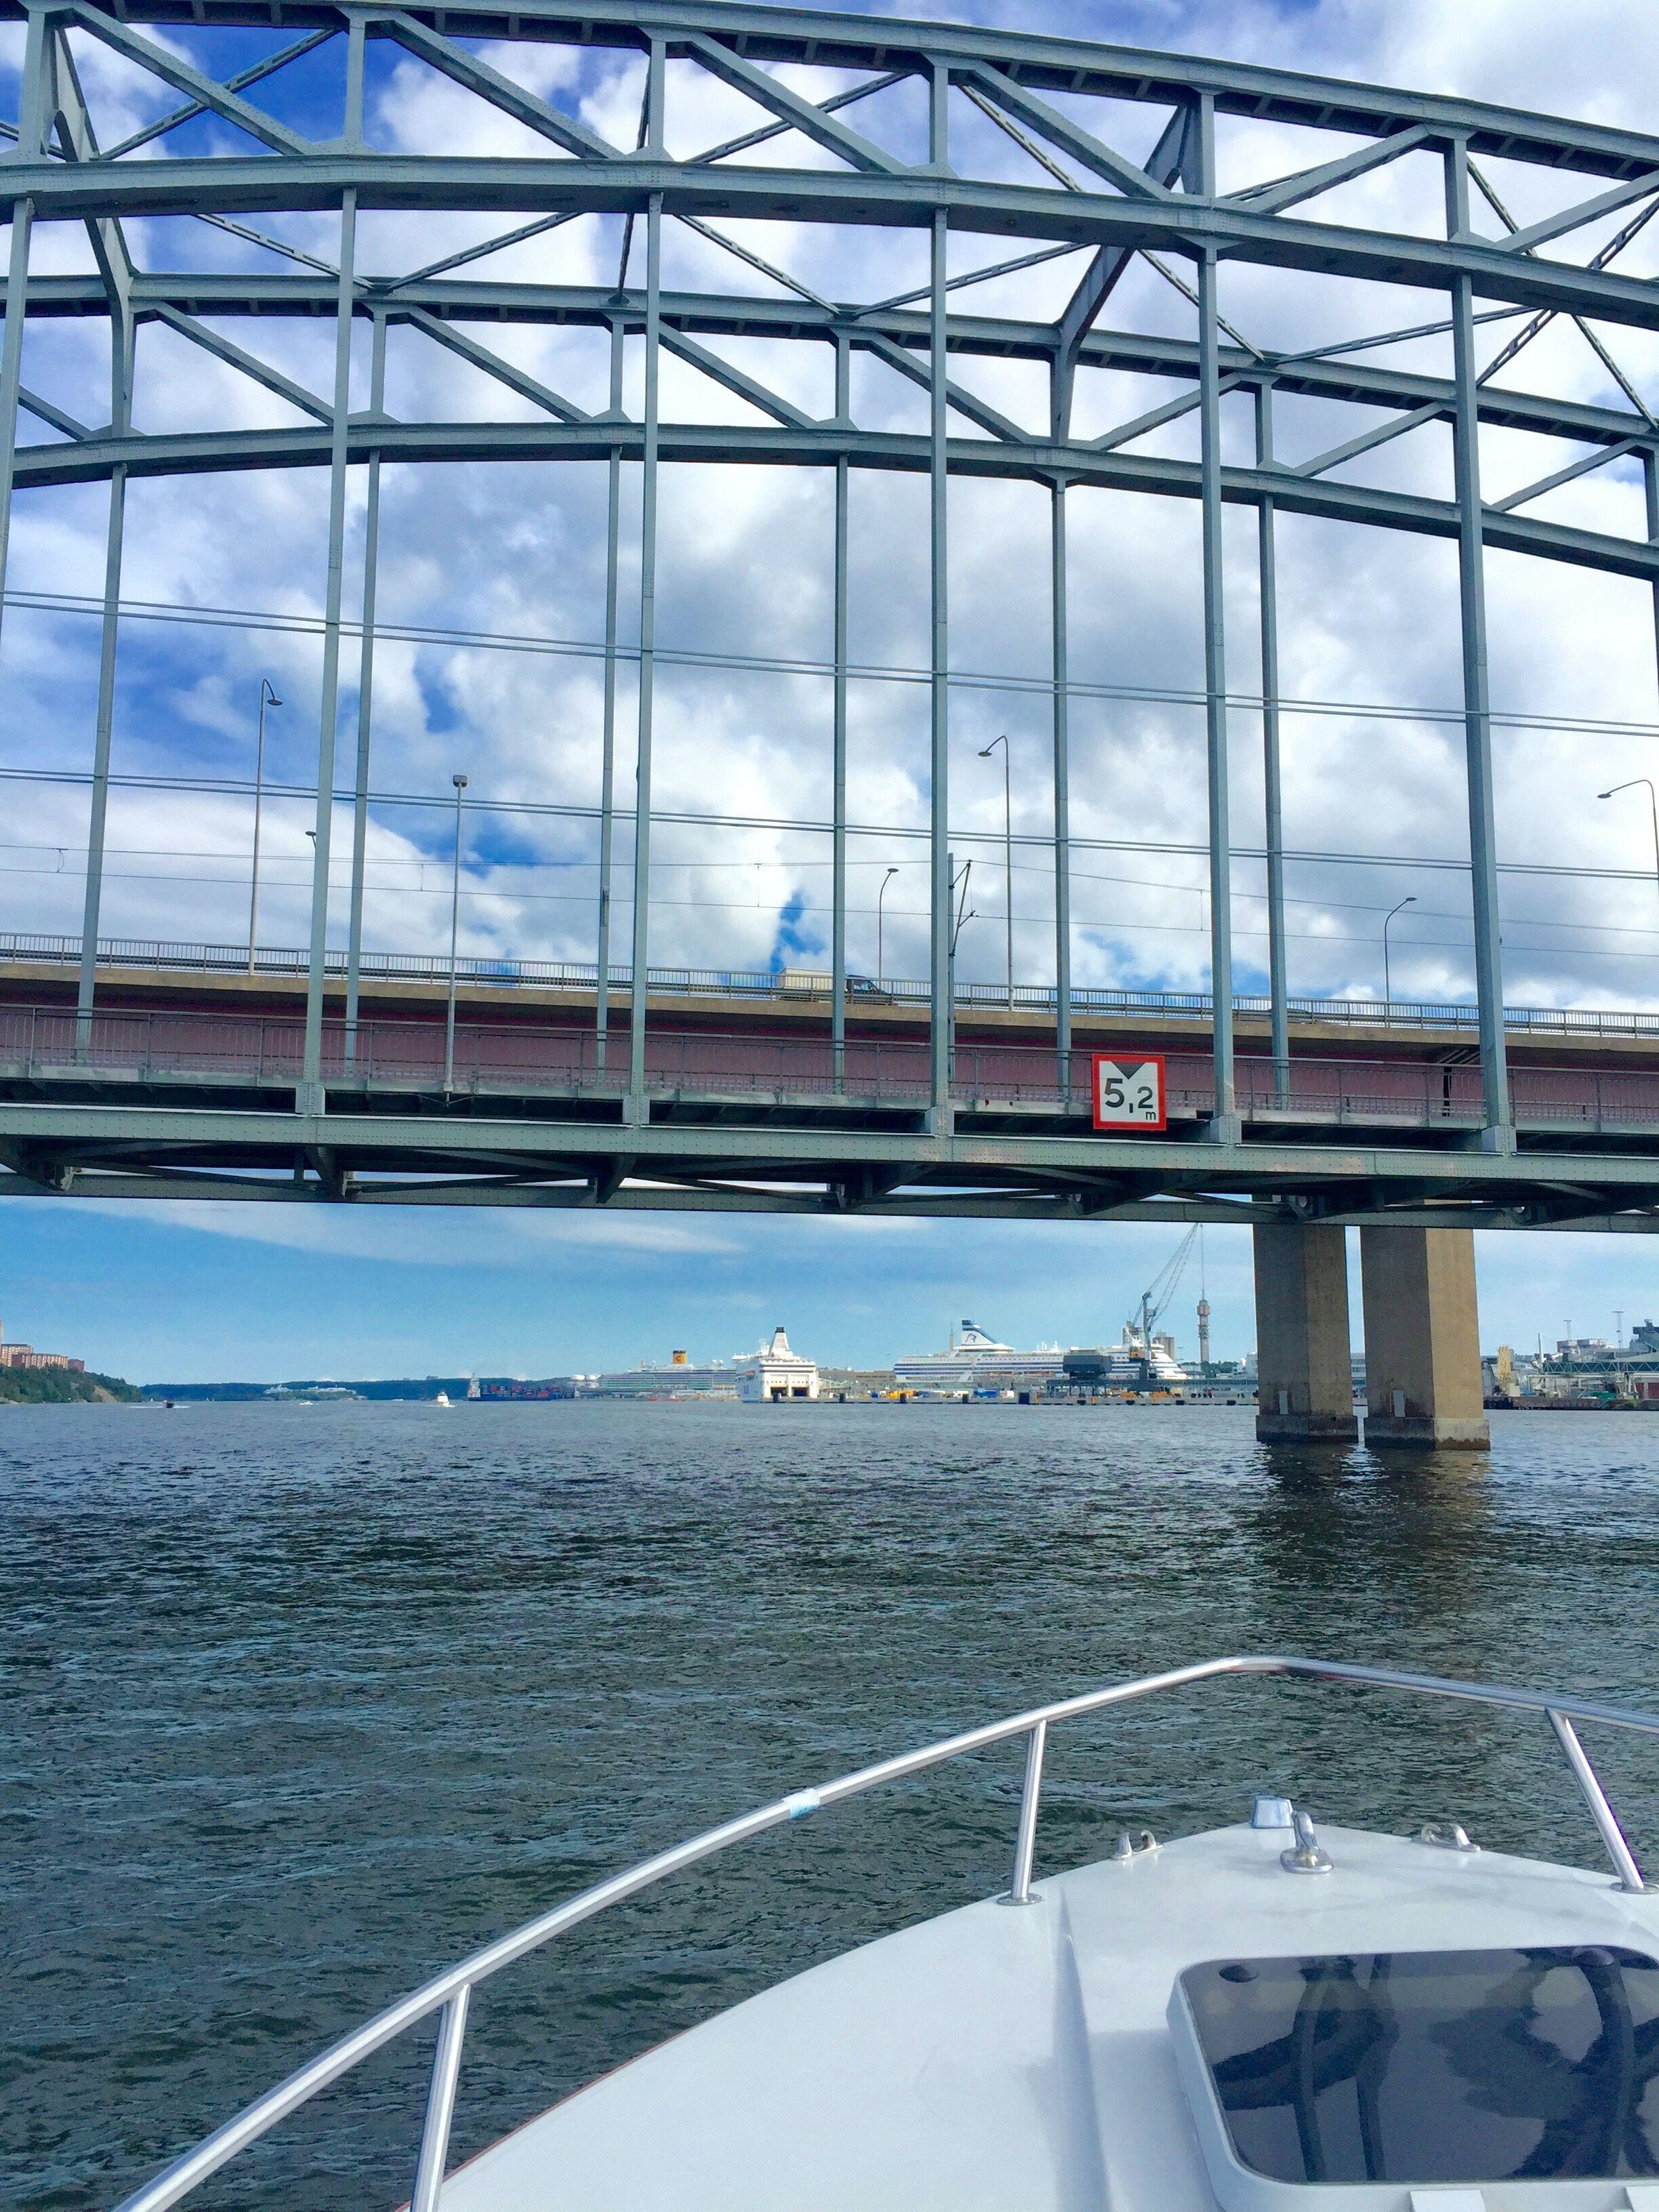 Stockholm Lidingöbron